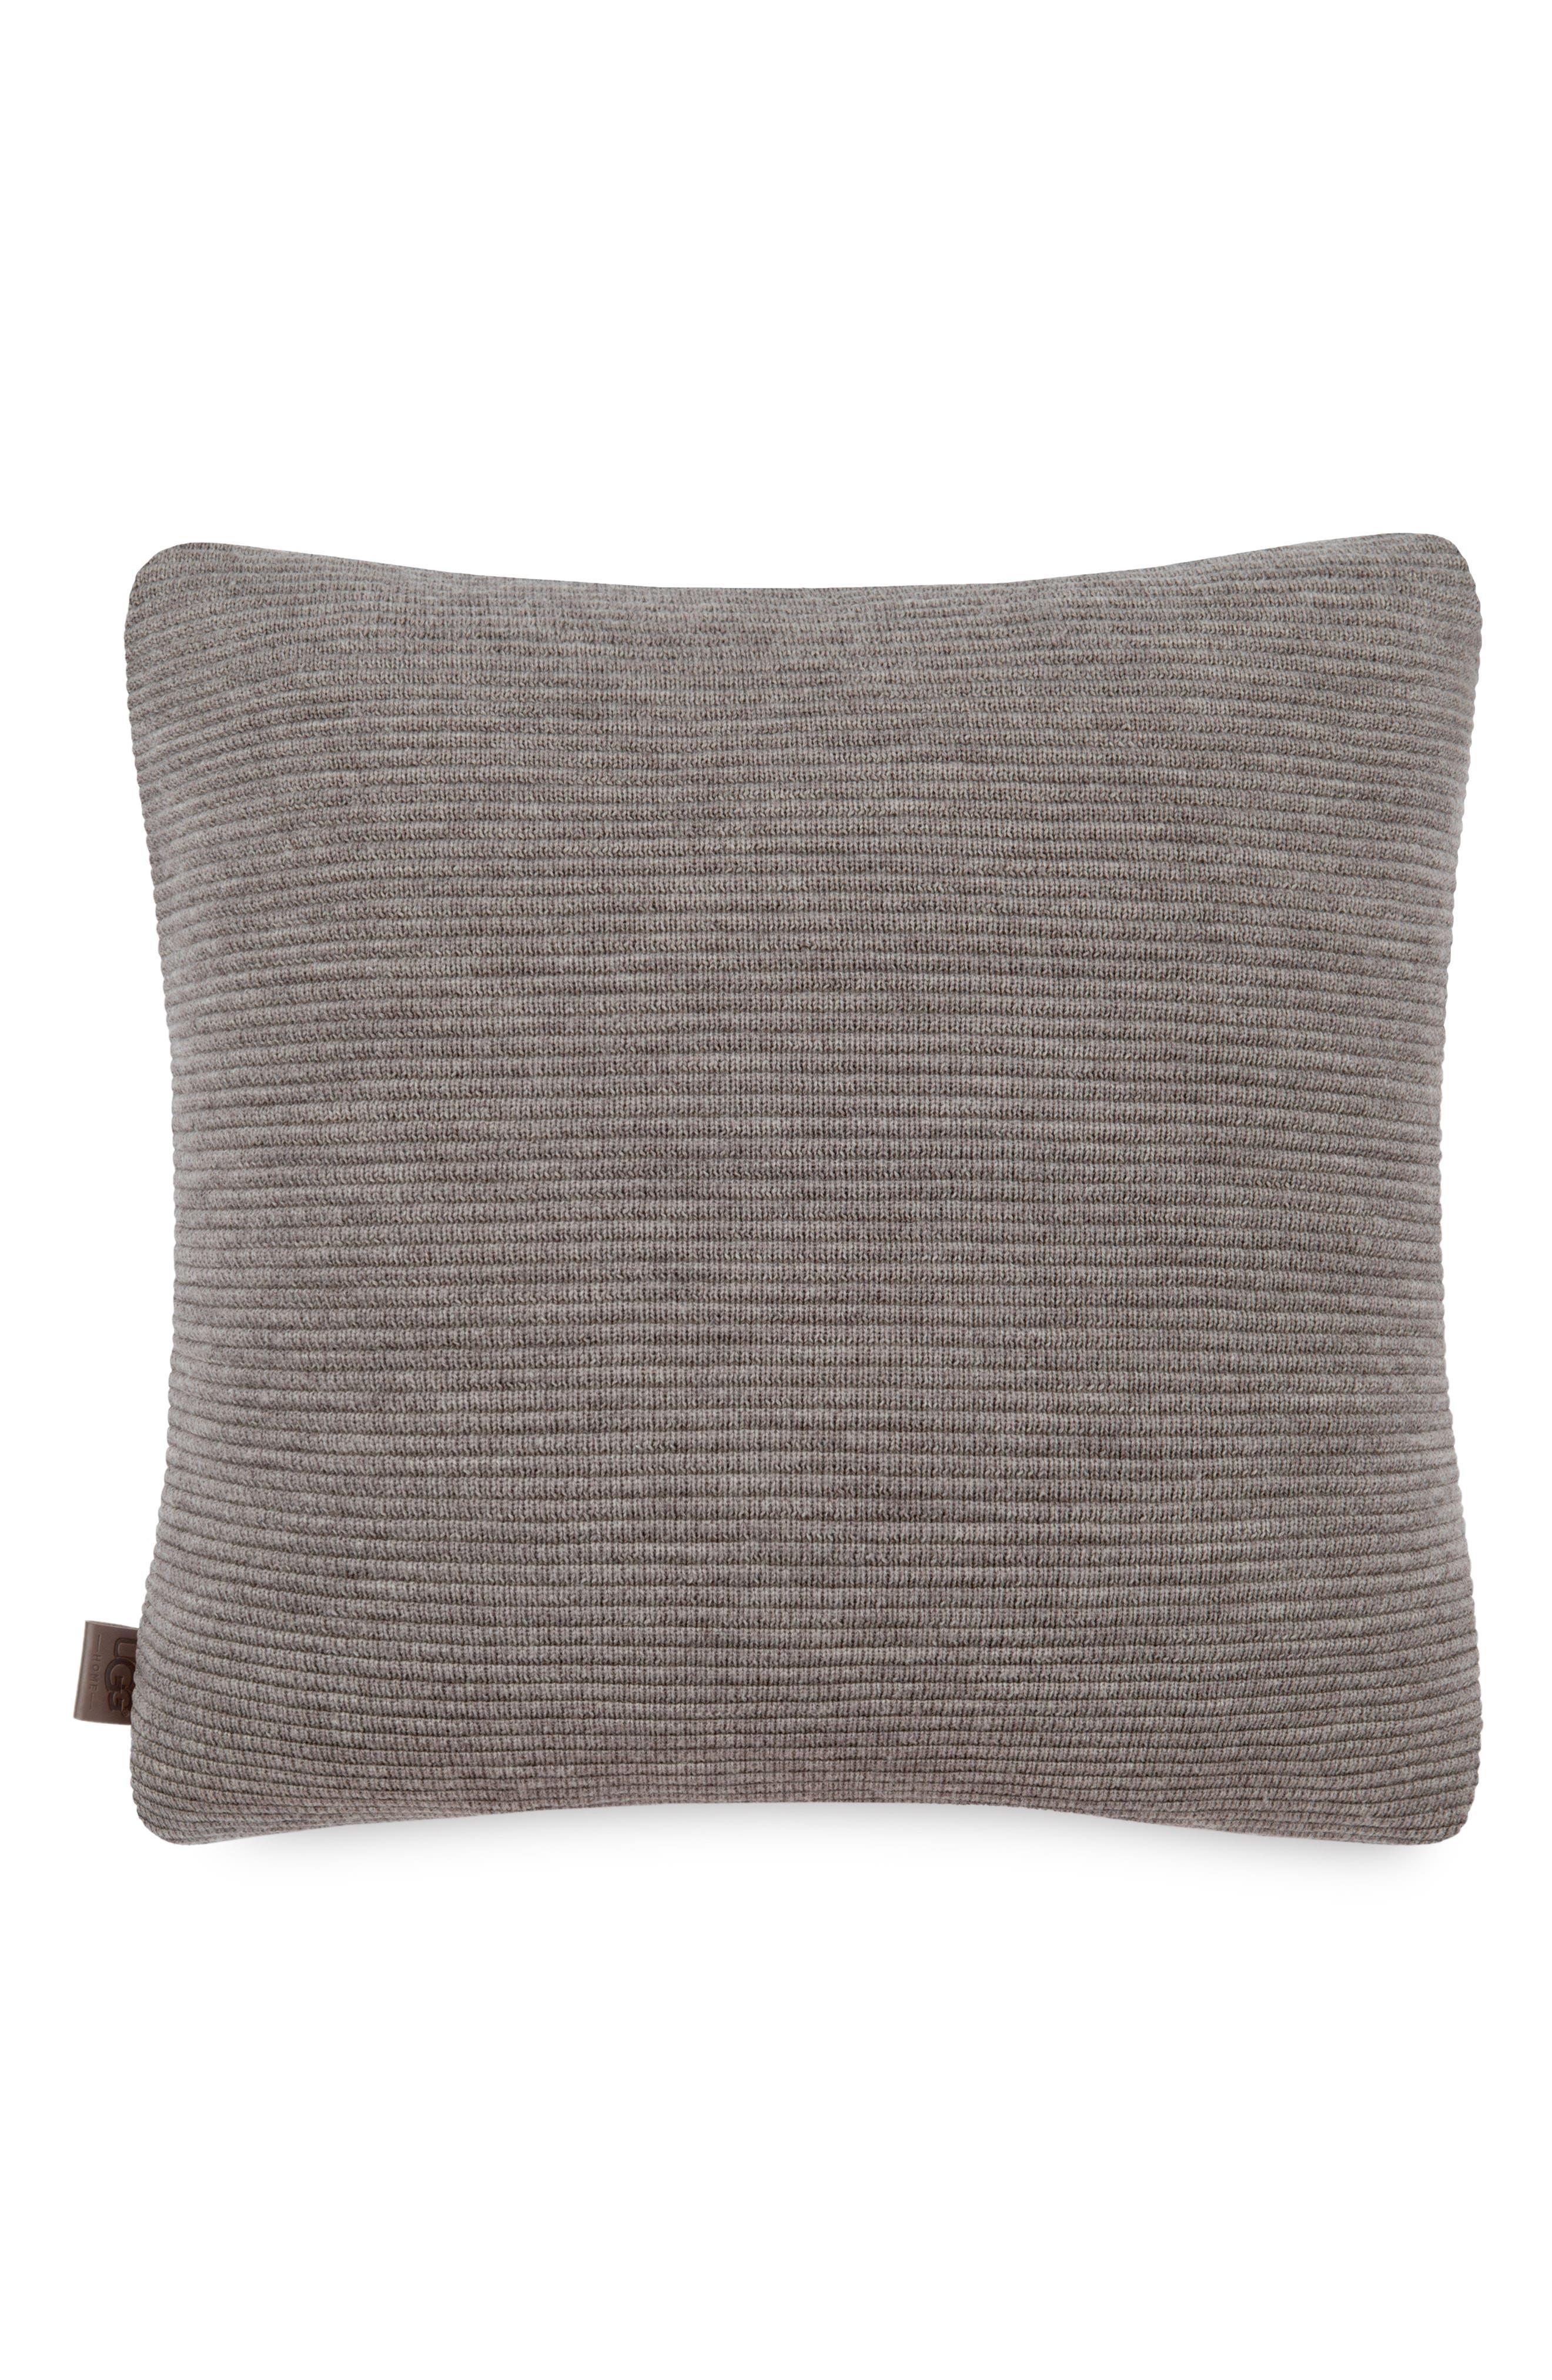 Horizontal Rib Pillow,                         Main,                         color, Fawn/ Doeskin